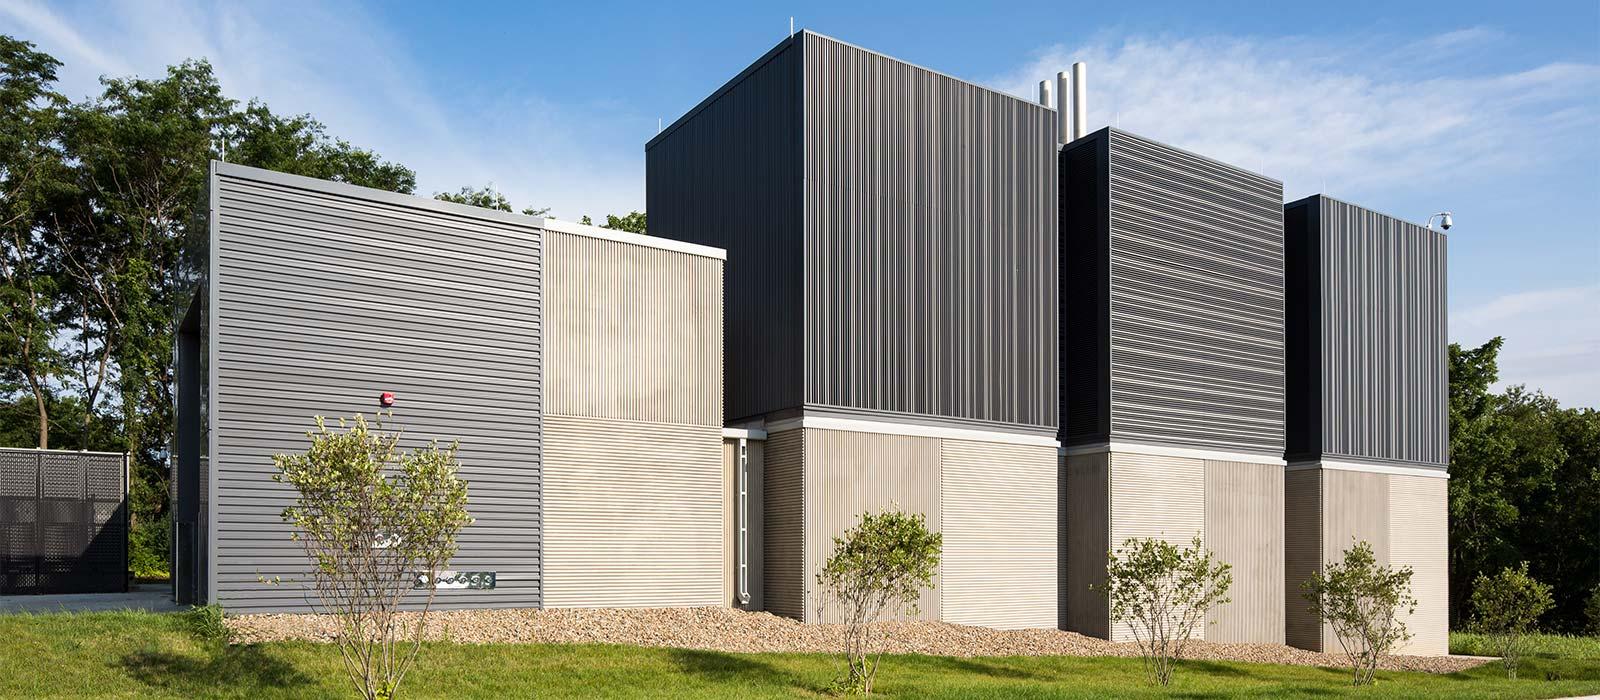 University of Iowa Hospitals and Clinics Generating Plant